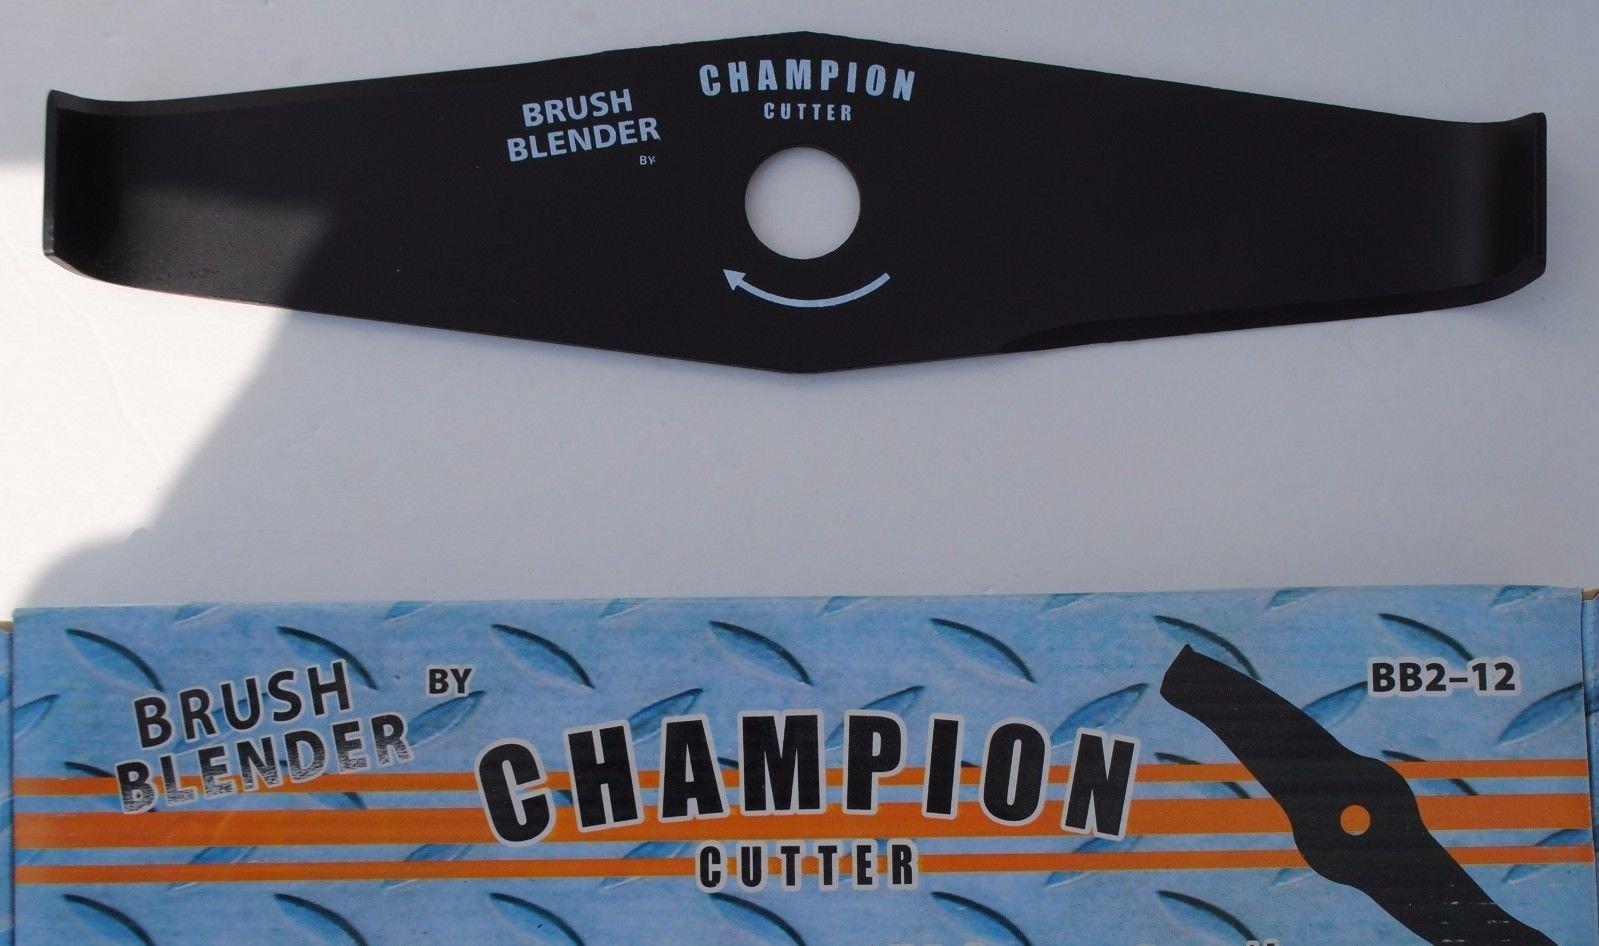 Brush Blender Brush Cutter Blade For Many Brands / Models of String Trimmers